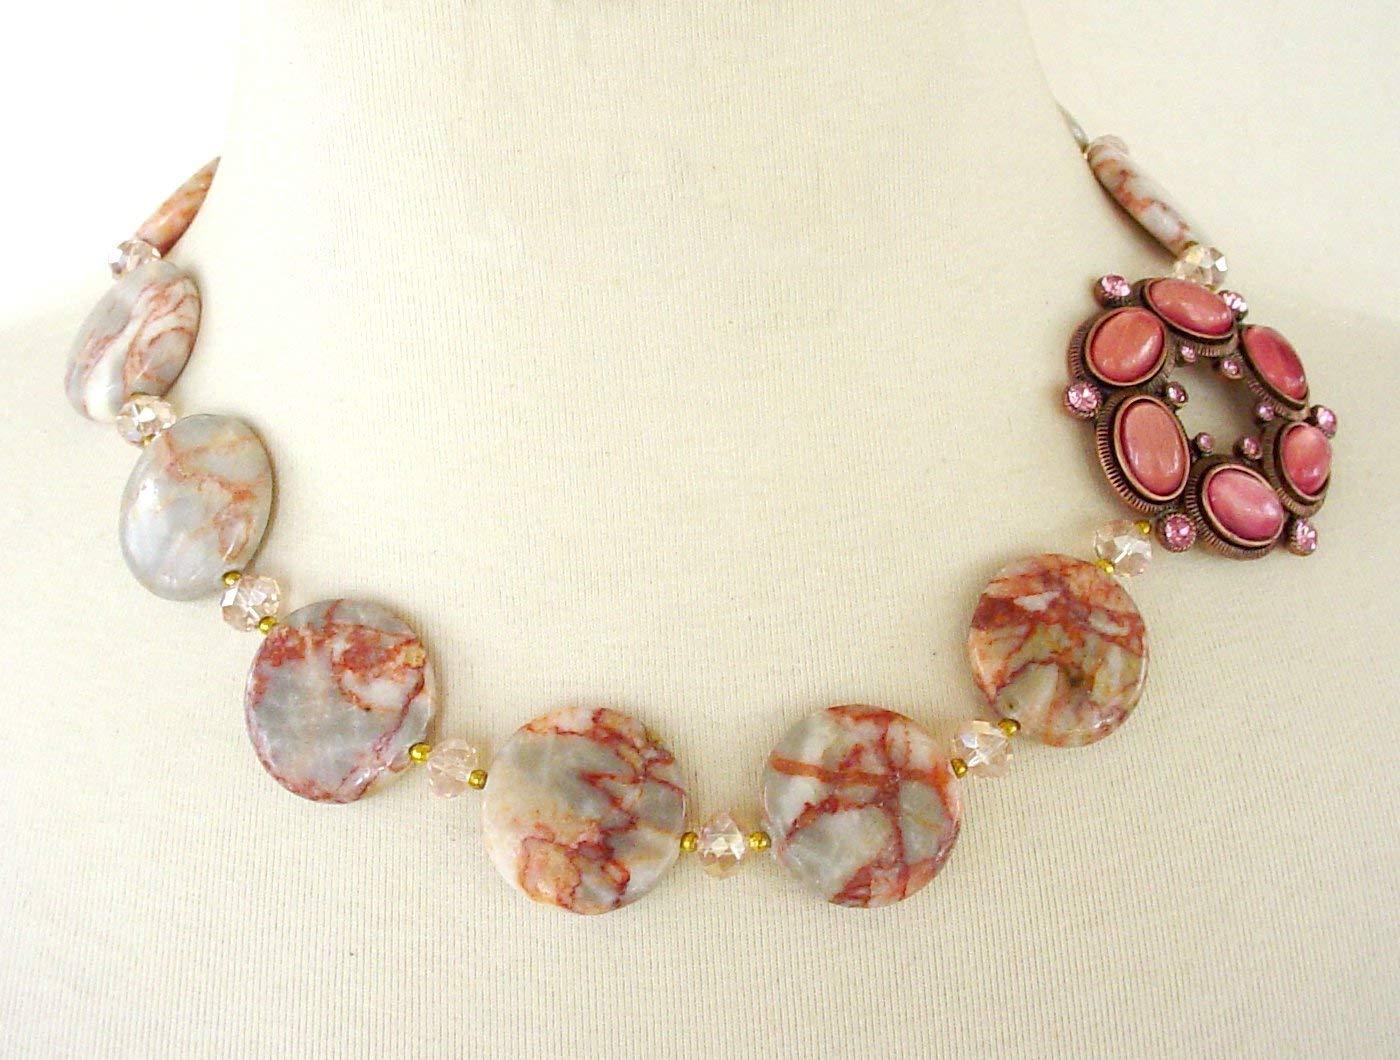 Vintage Brooch Necklace, Asymmetrical Statement Necklace, Coral Jasper Coin Beads, Matching Bracelet